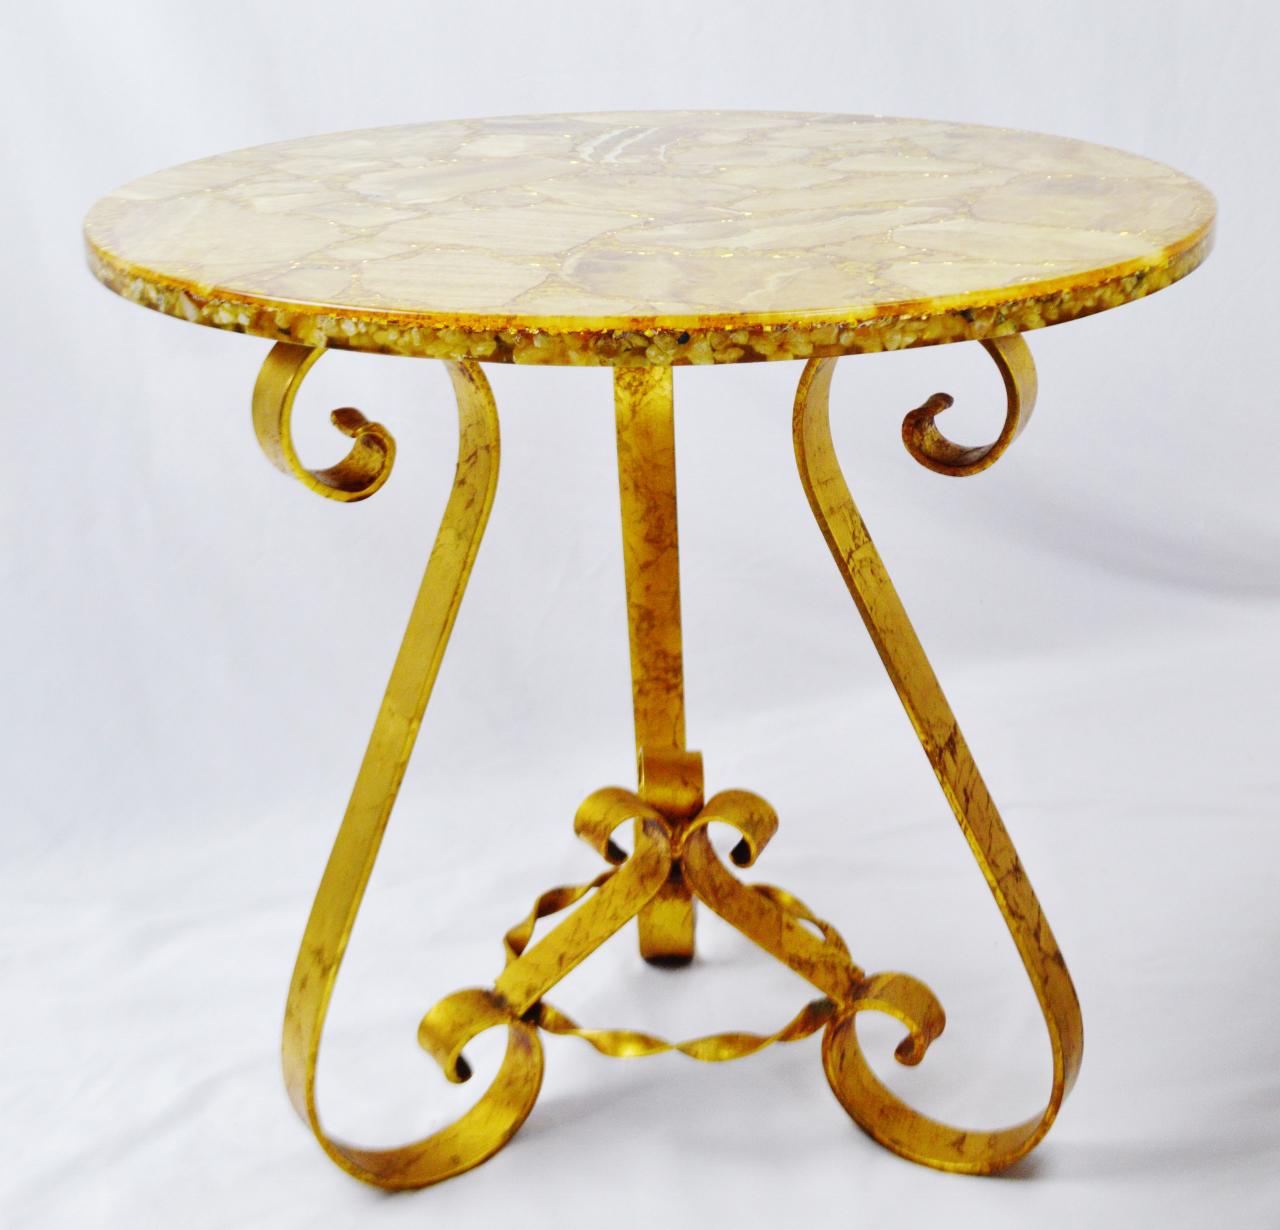 vintage enzo missoni stone & gold leaf coffee & end tables - set of